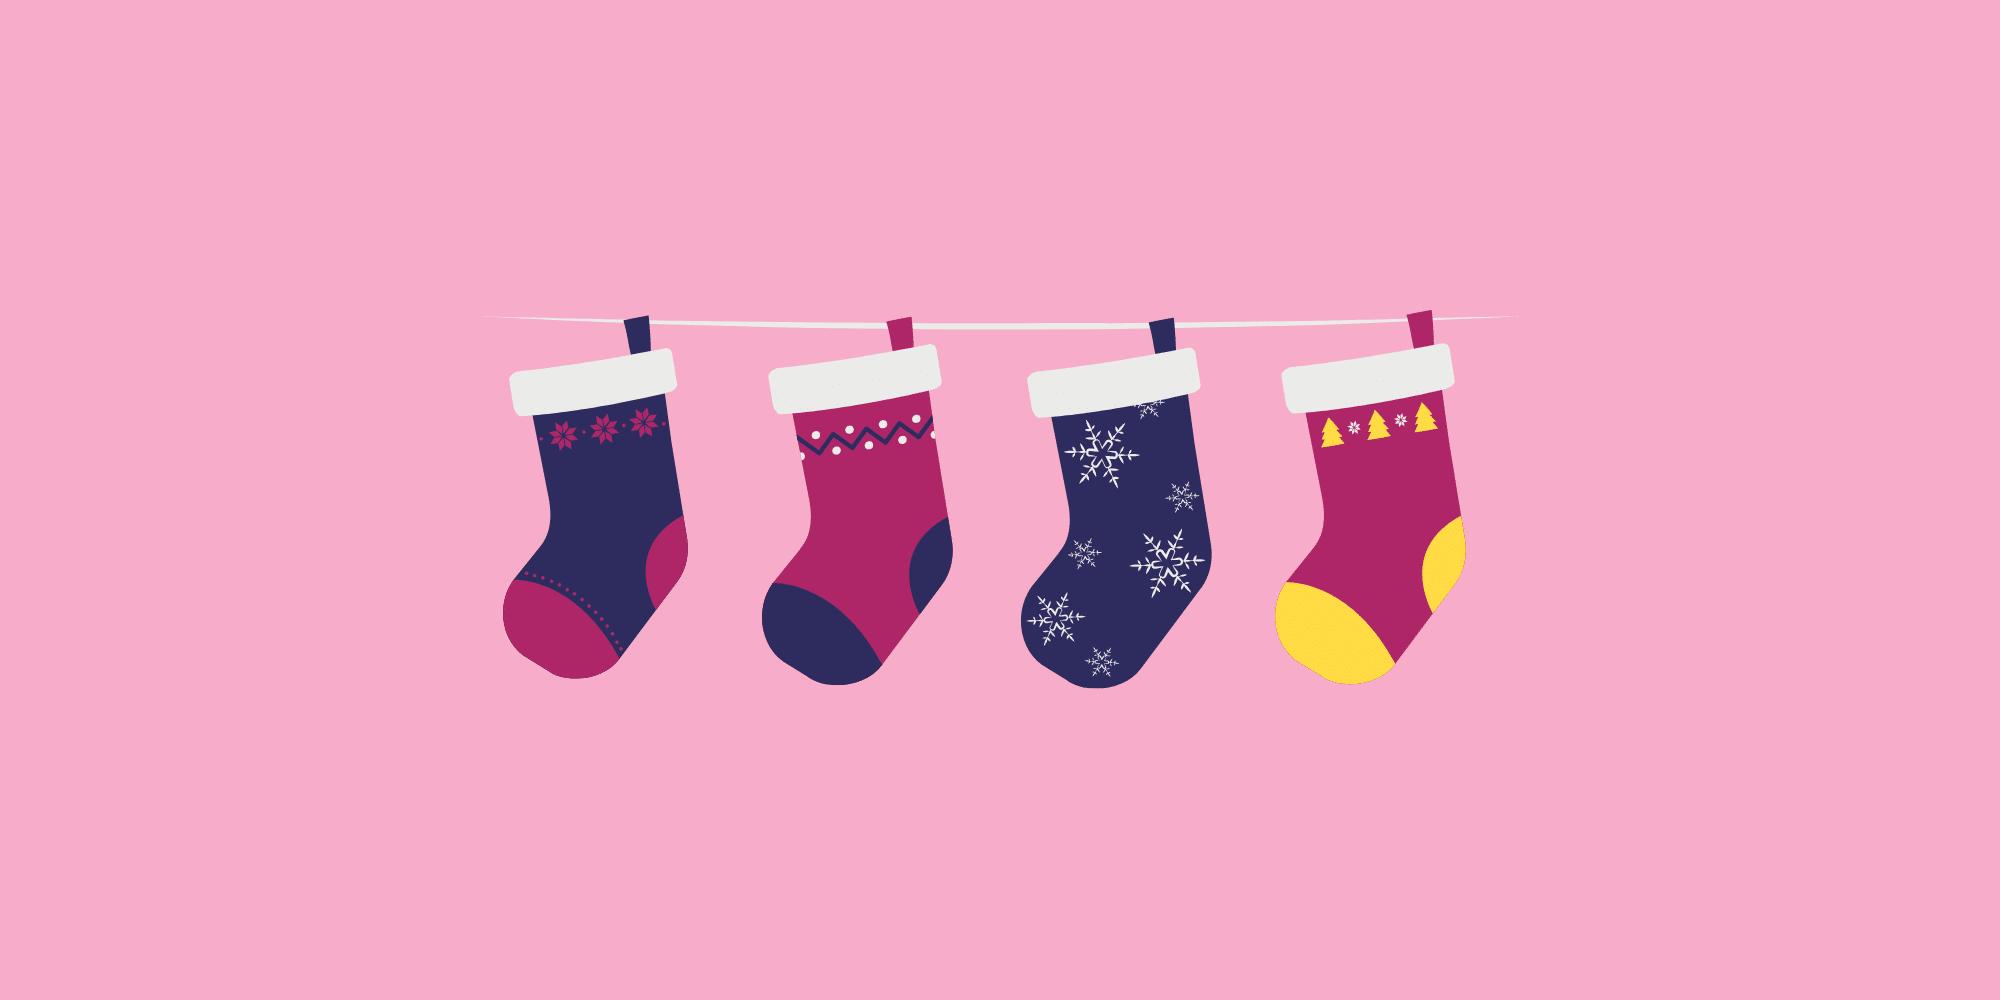 stocking-stuffers-for-kids